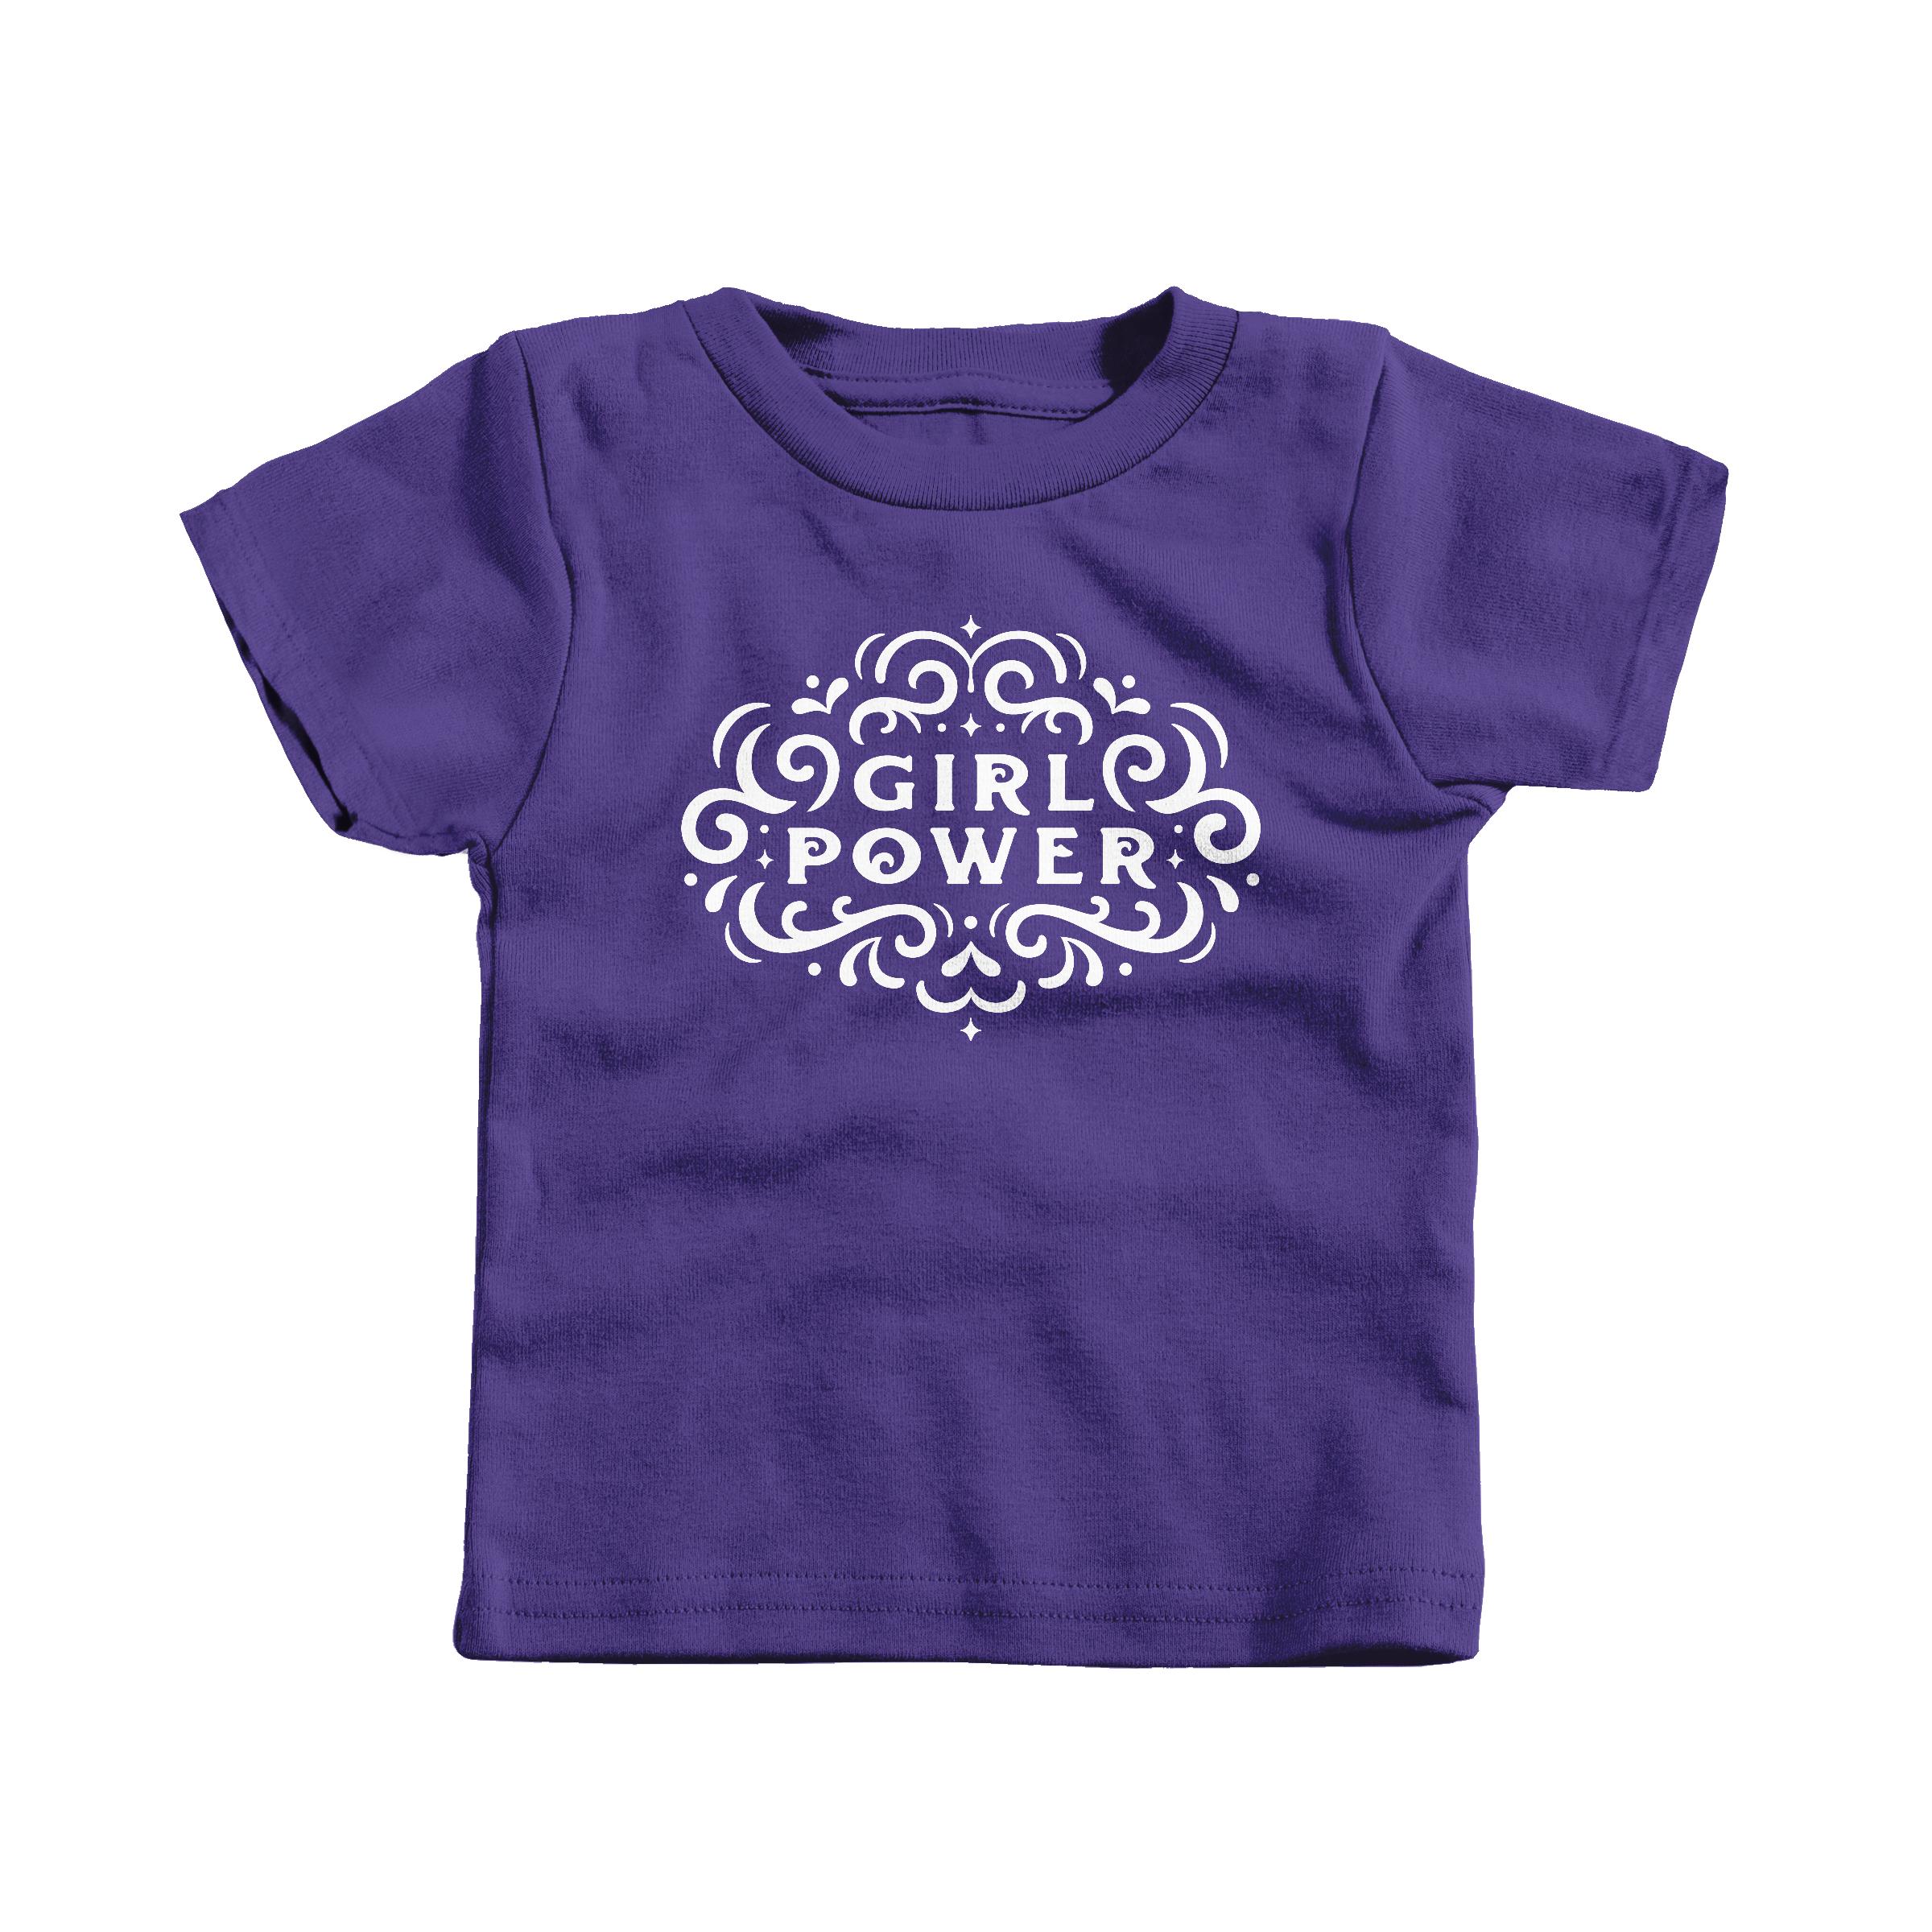 Girl Power Purple (T-Shirt)